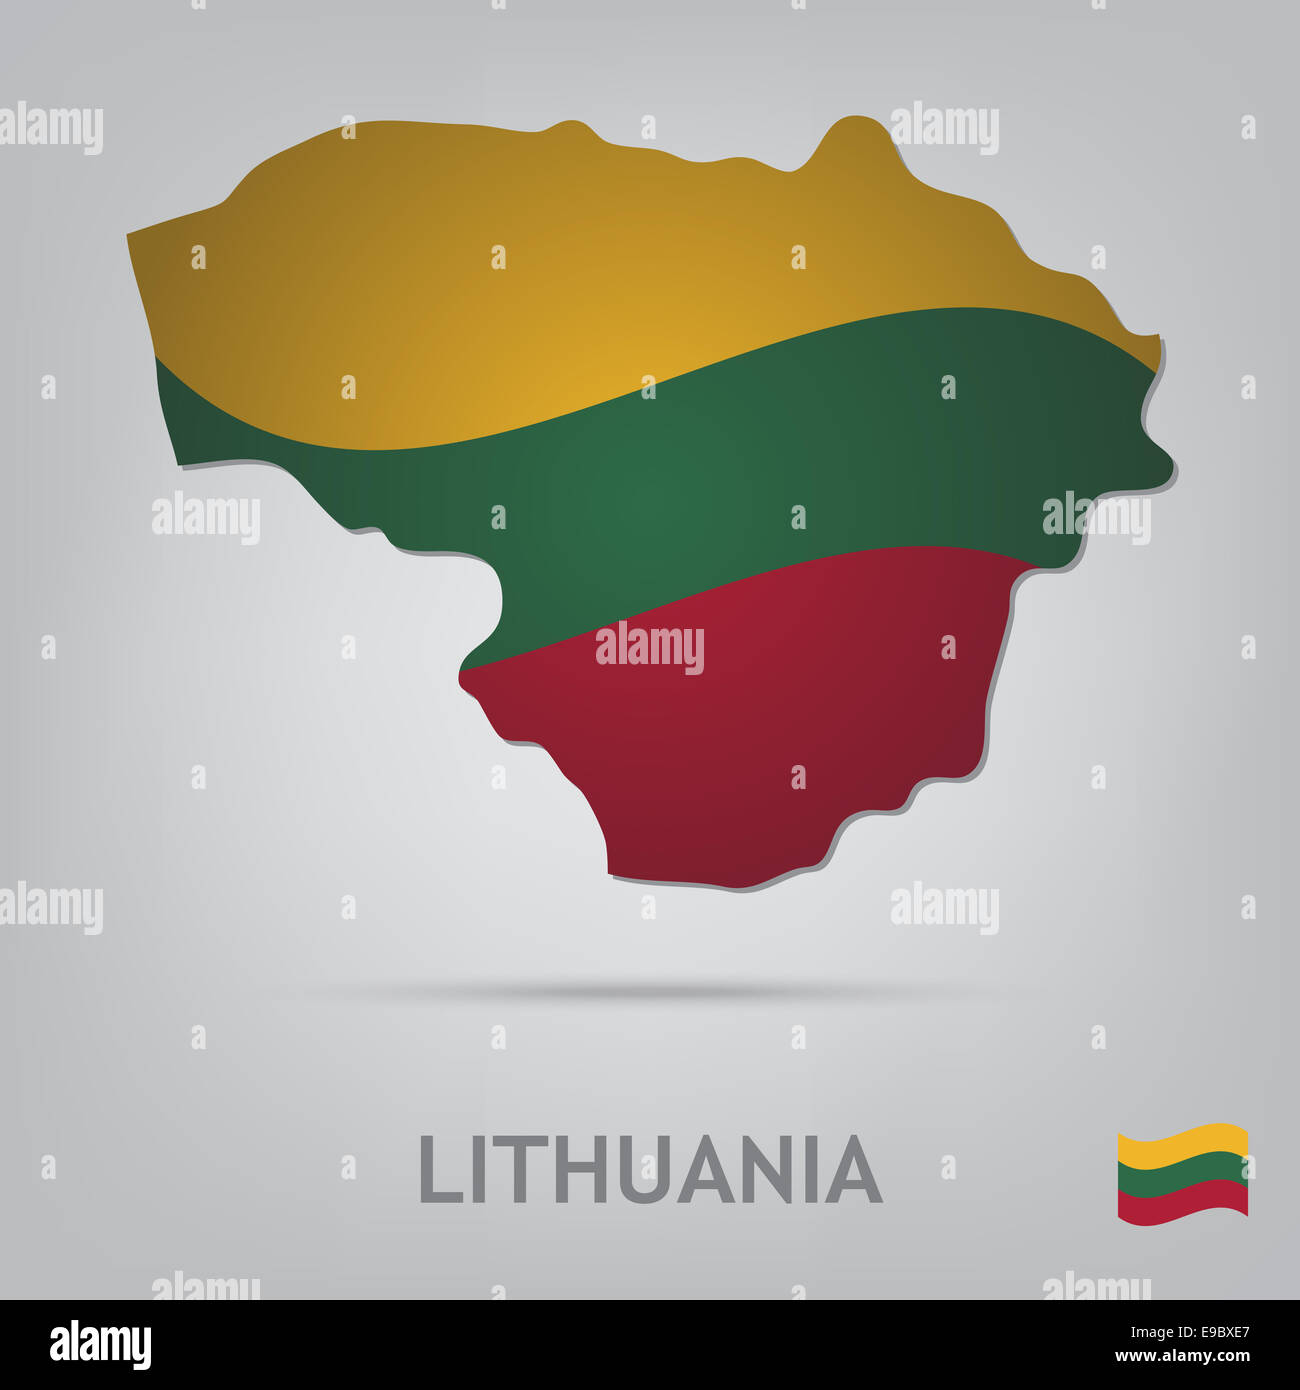 lithuania - Stock Image